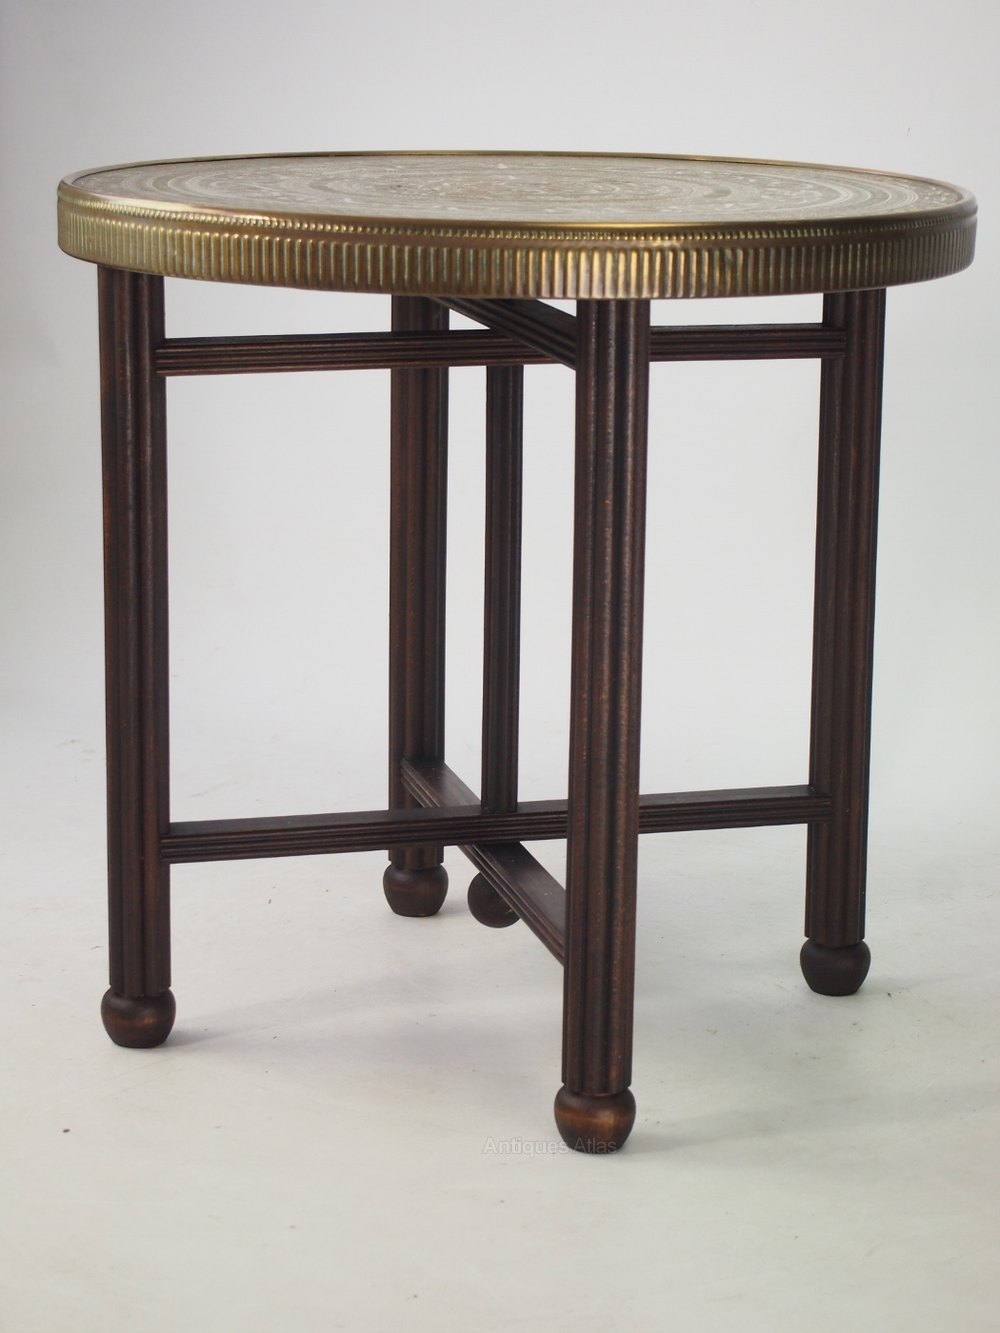 Berber Benares Brass Tray Top Coffee Table Antiques Atlas